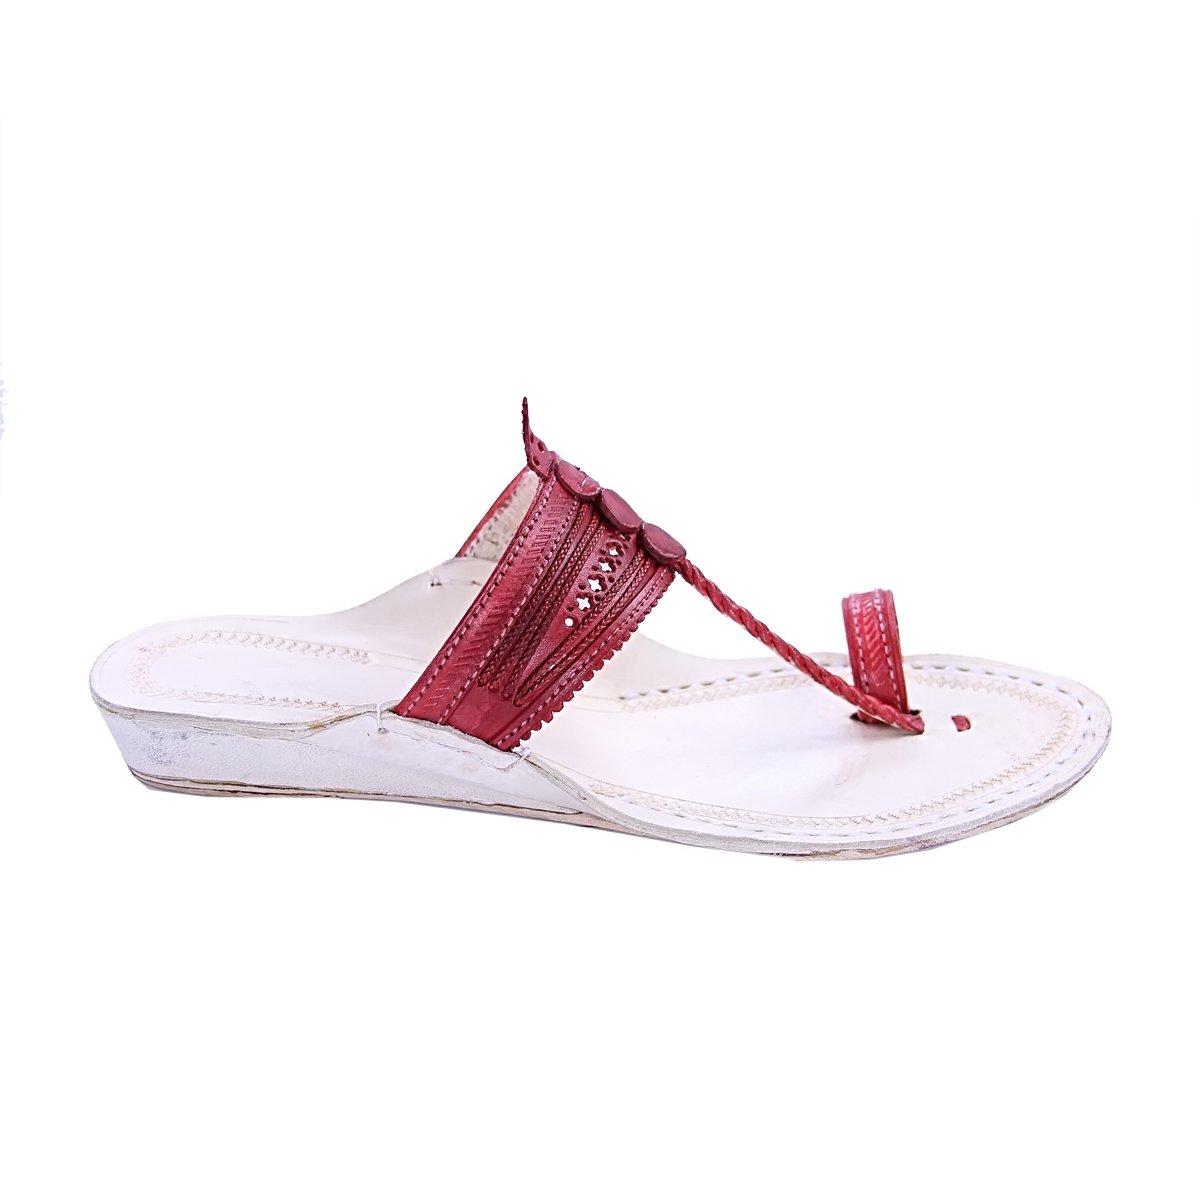 KOLHAPURI CHAPPAL Original Awesome Look Cherry Red Color Platform Heel Ladies Slipper Sandal